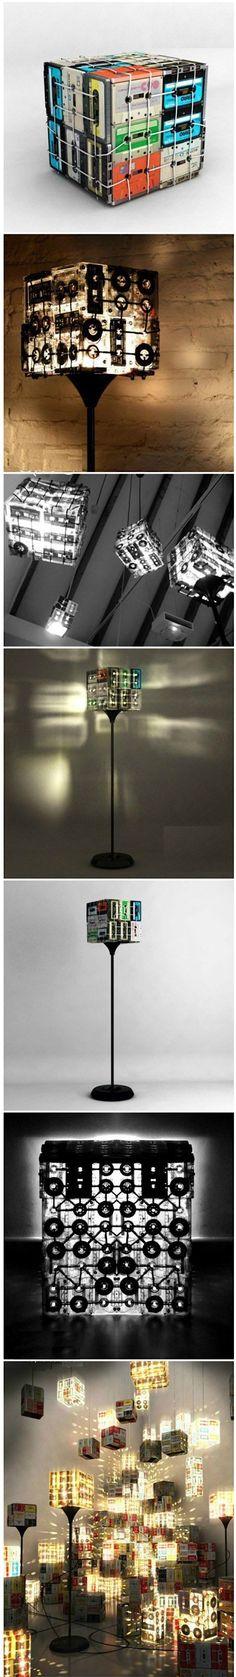 Selbstgemacht Lampen aus Musikkassetten